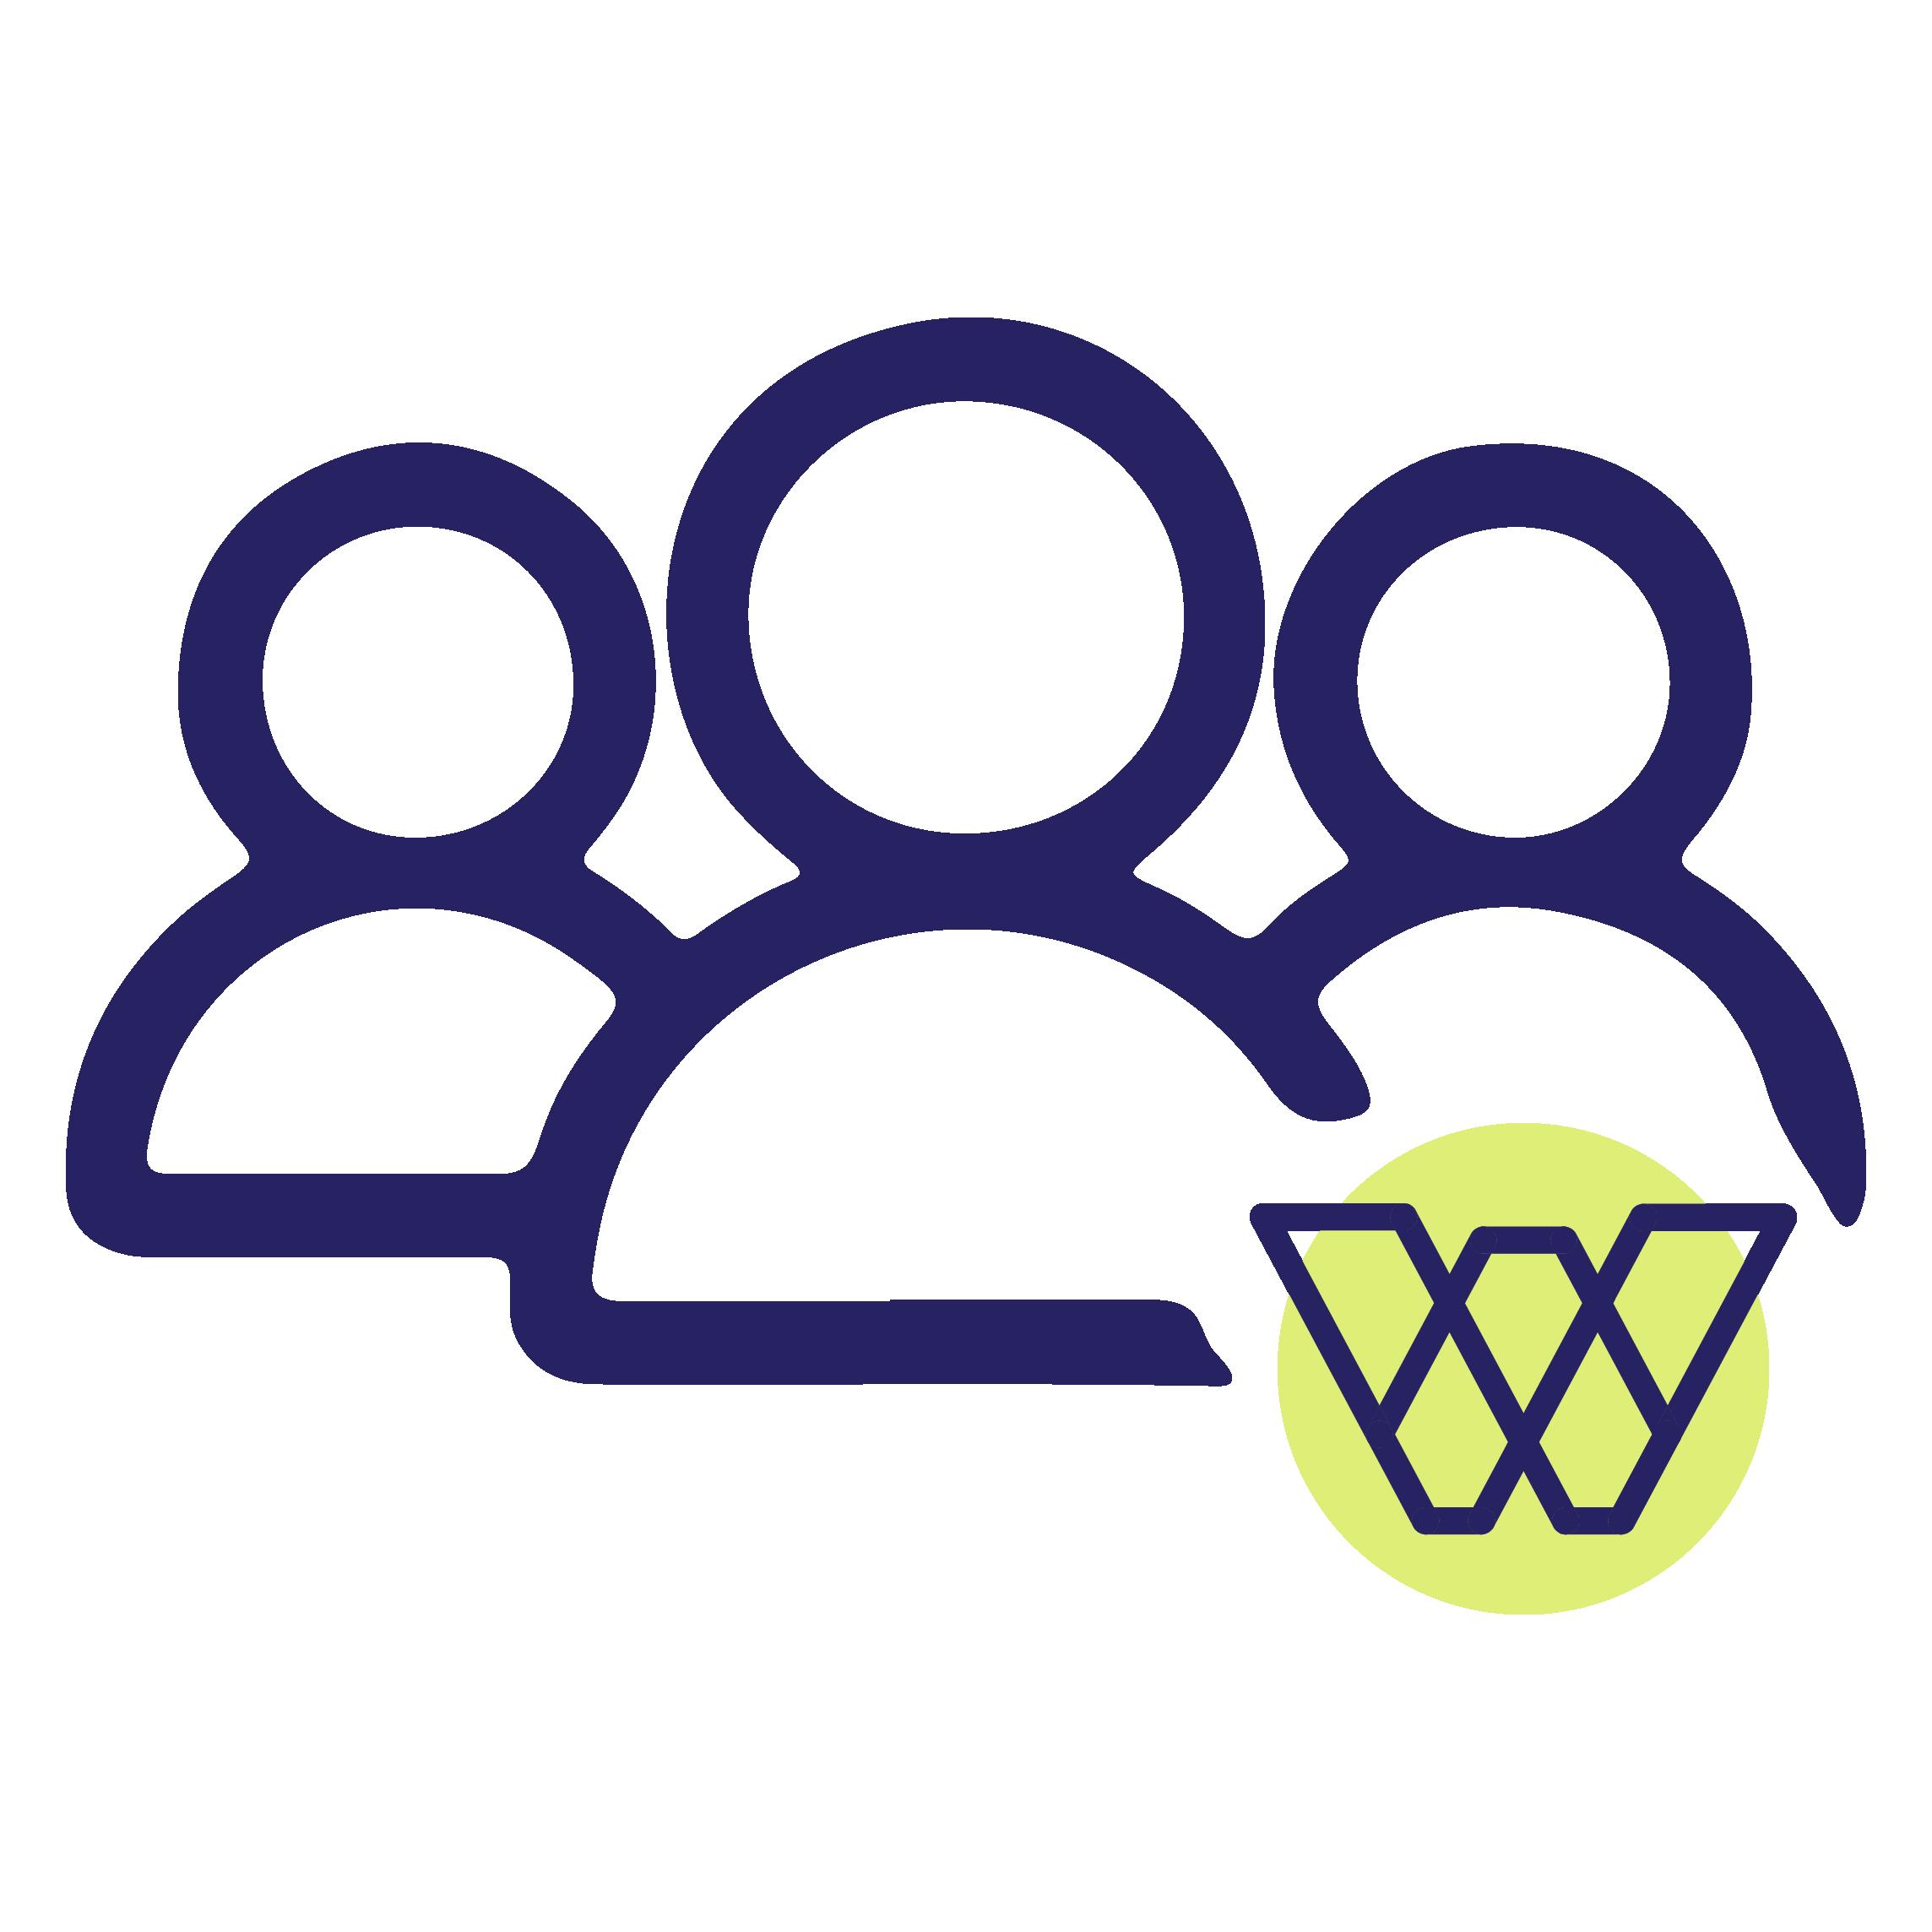 member_community_icon